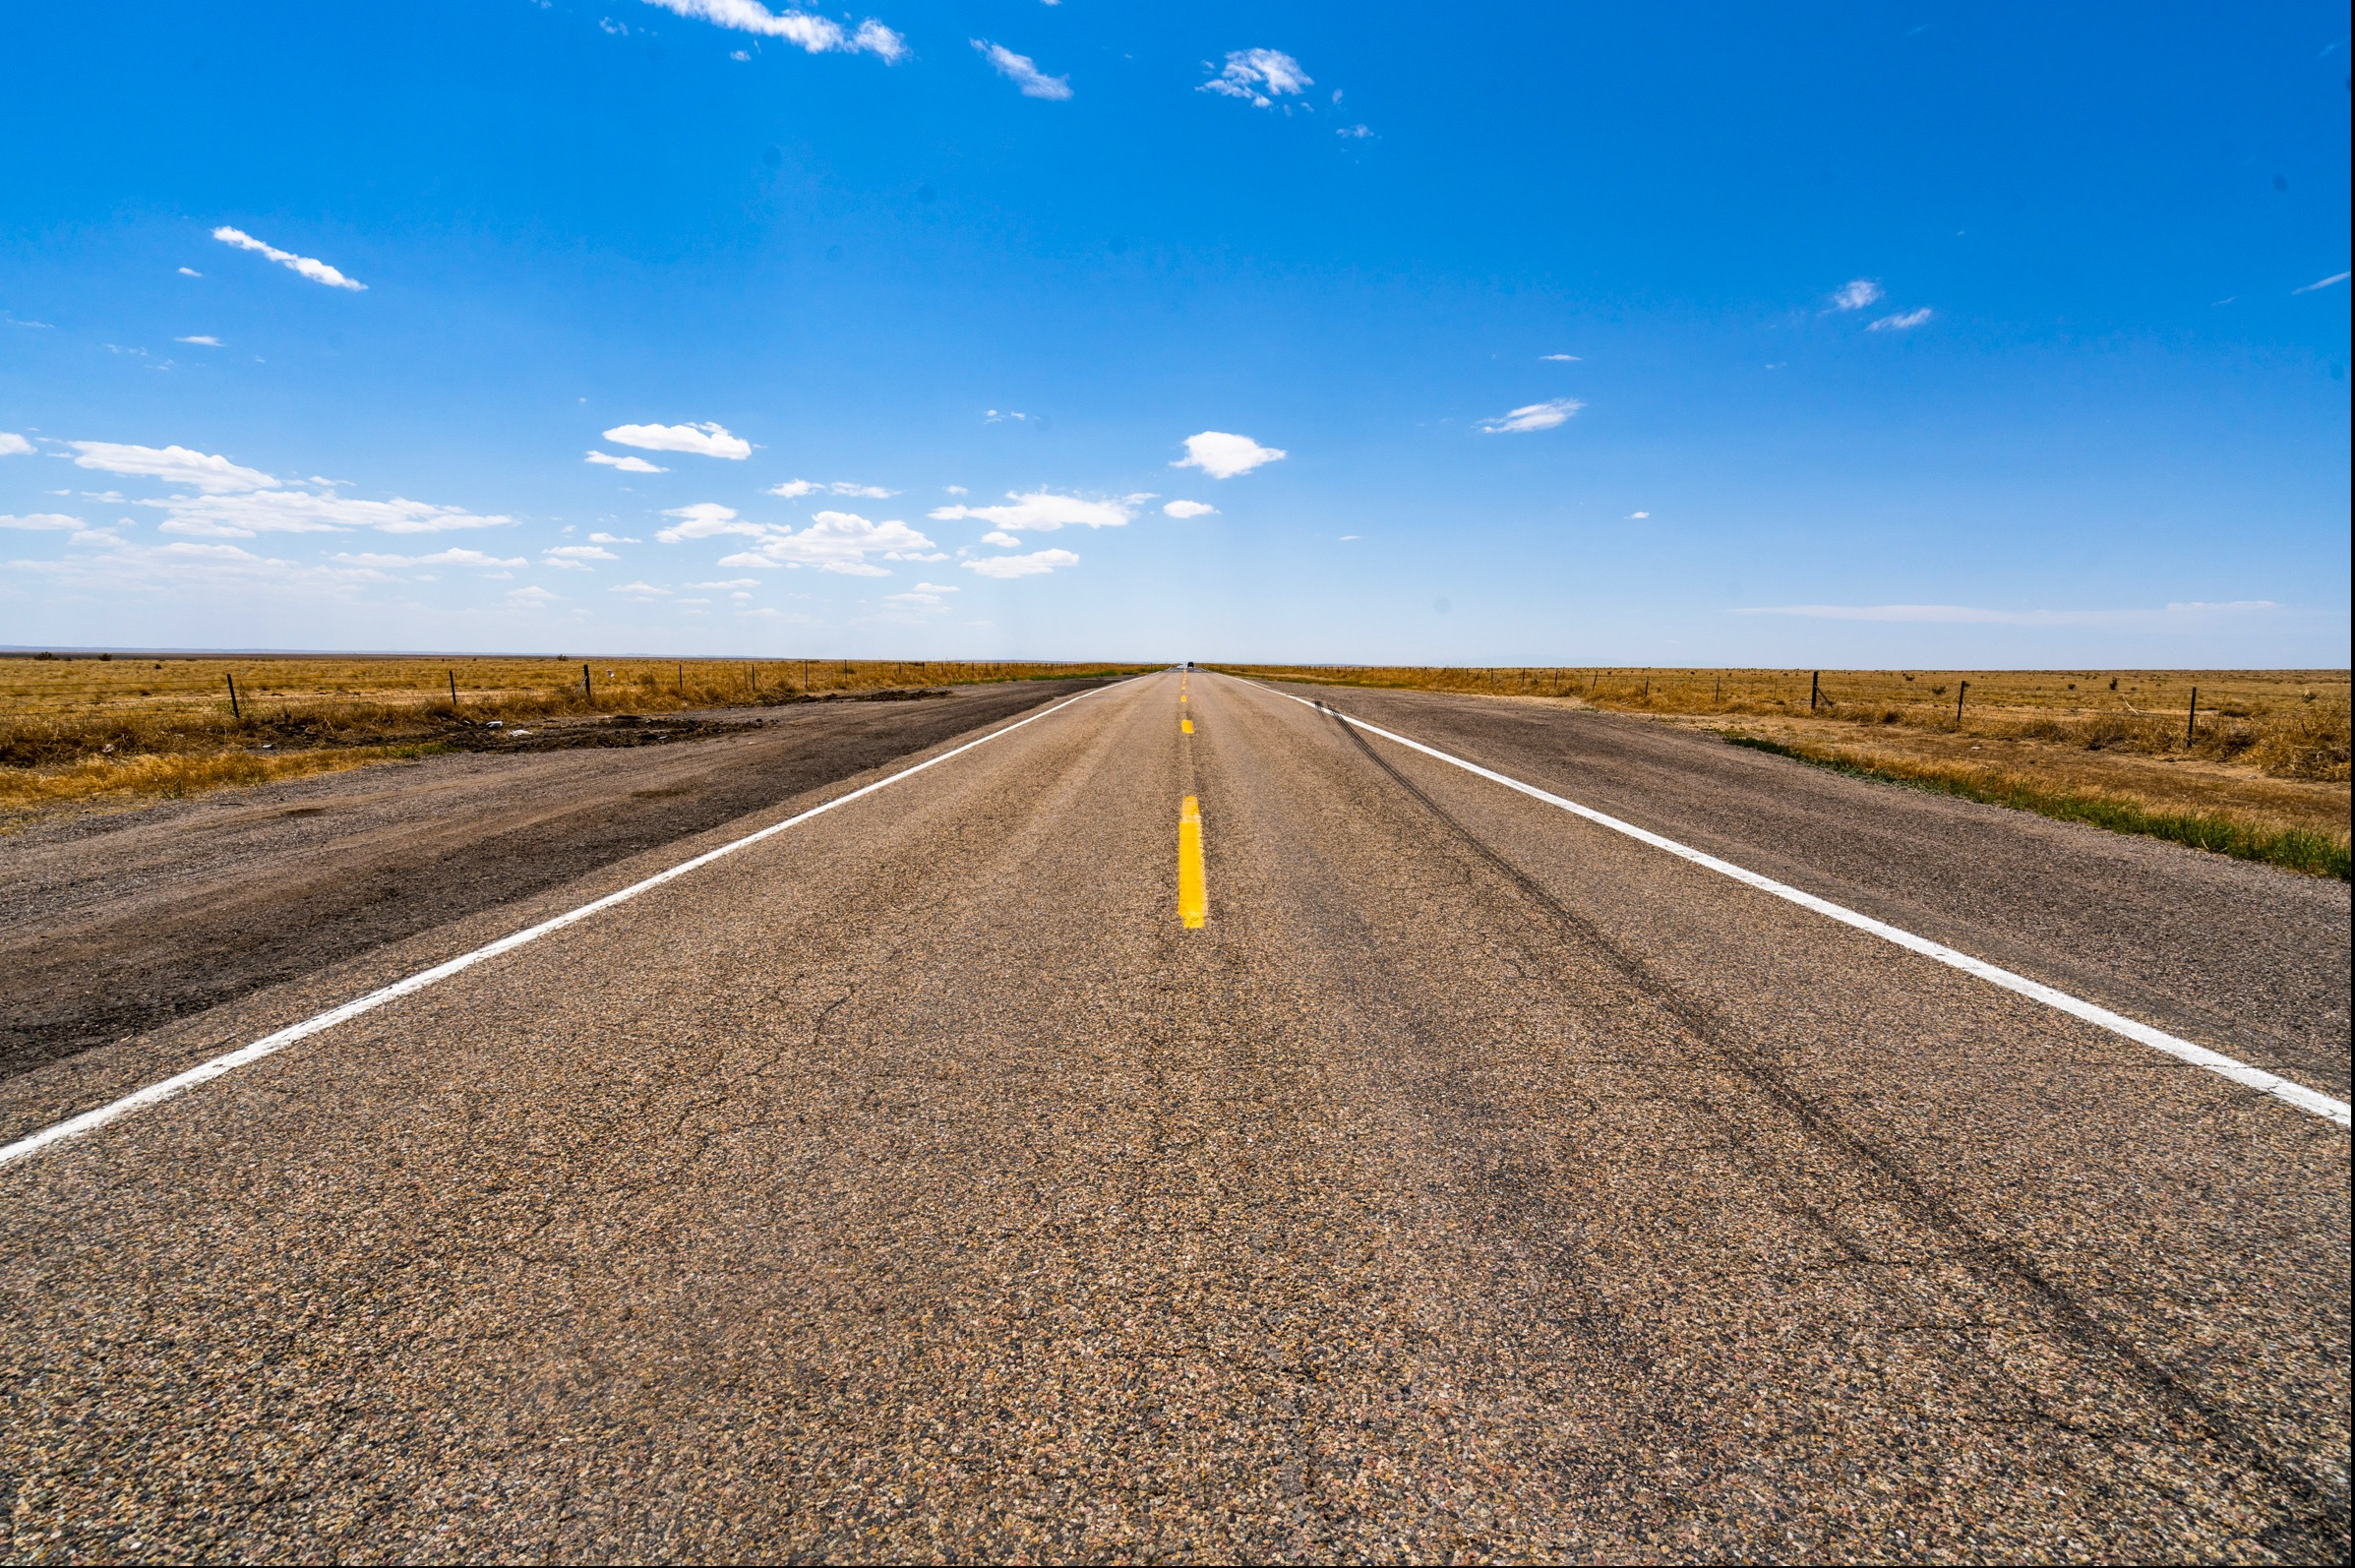 Road in southern Colorado